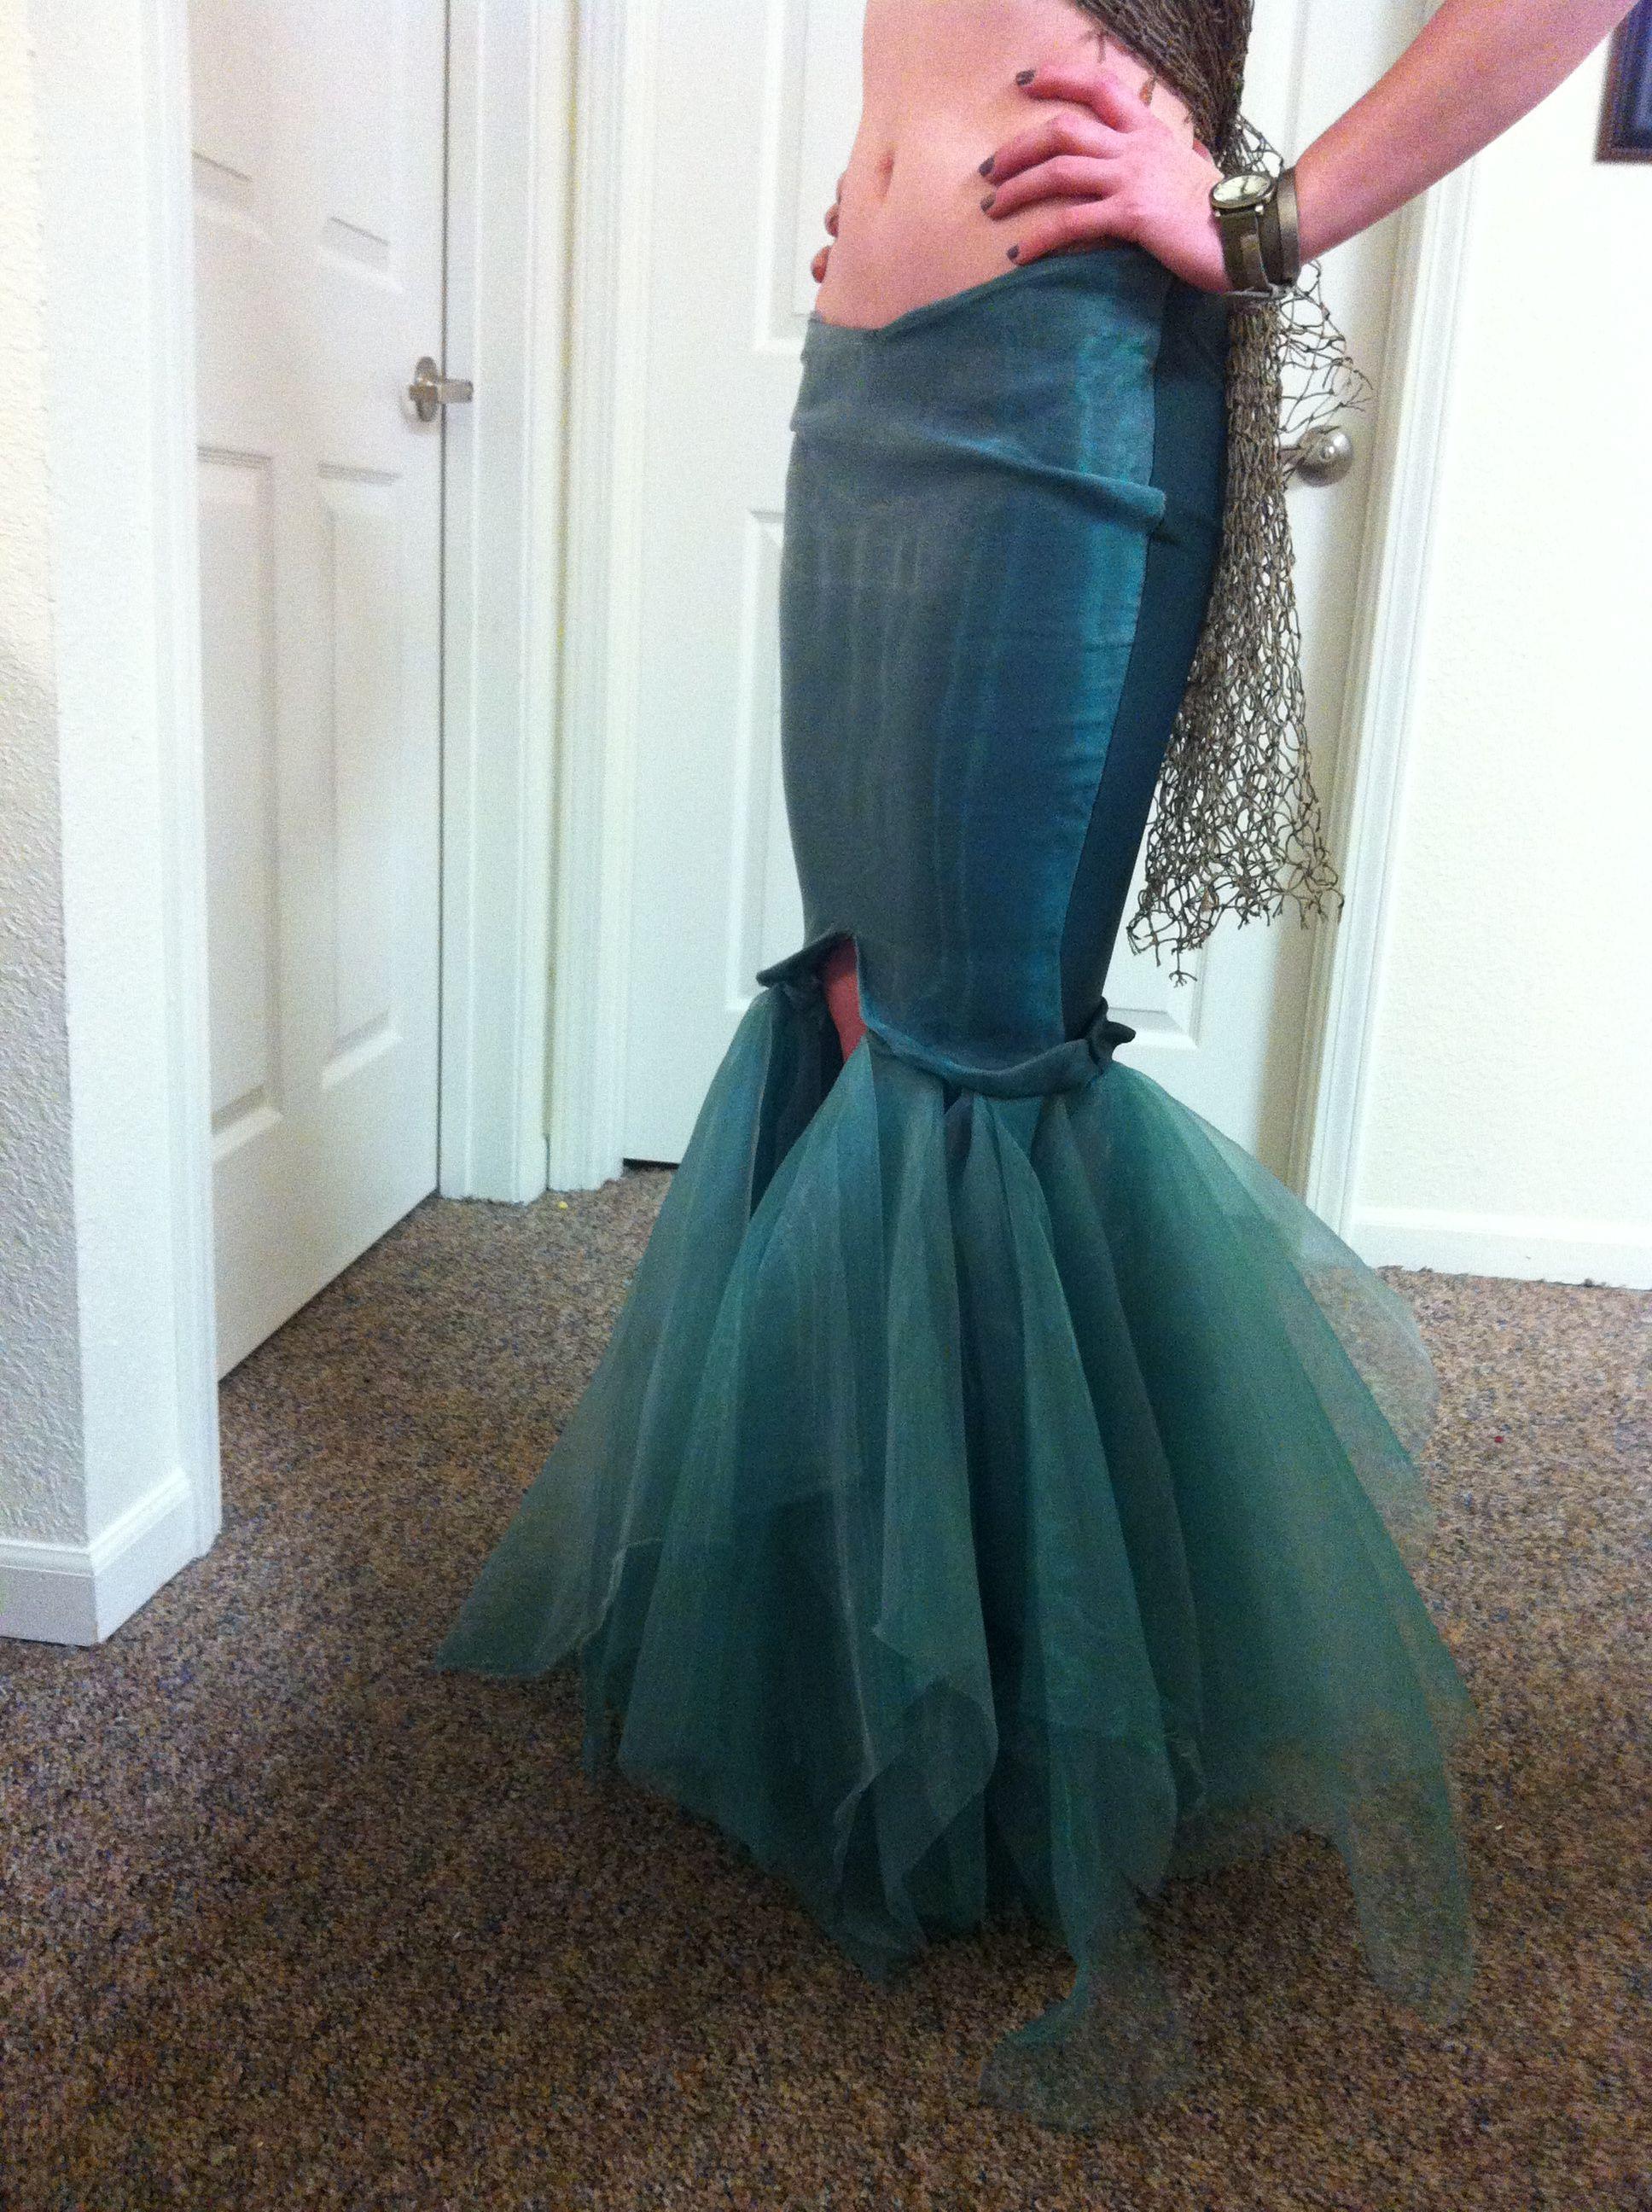 My Diy Hand Sewn Mermaid Halloween Costume I M Actually Proud That